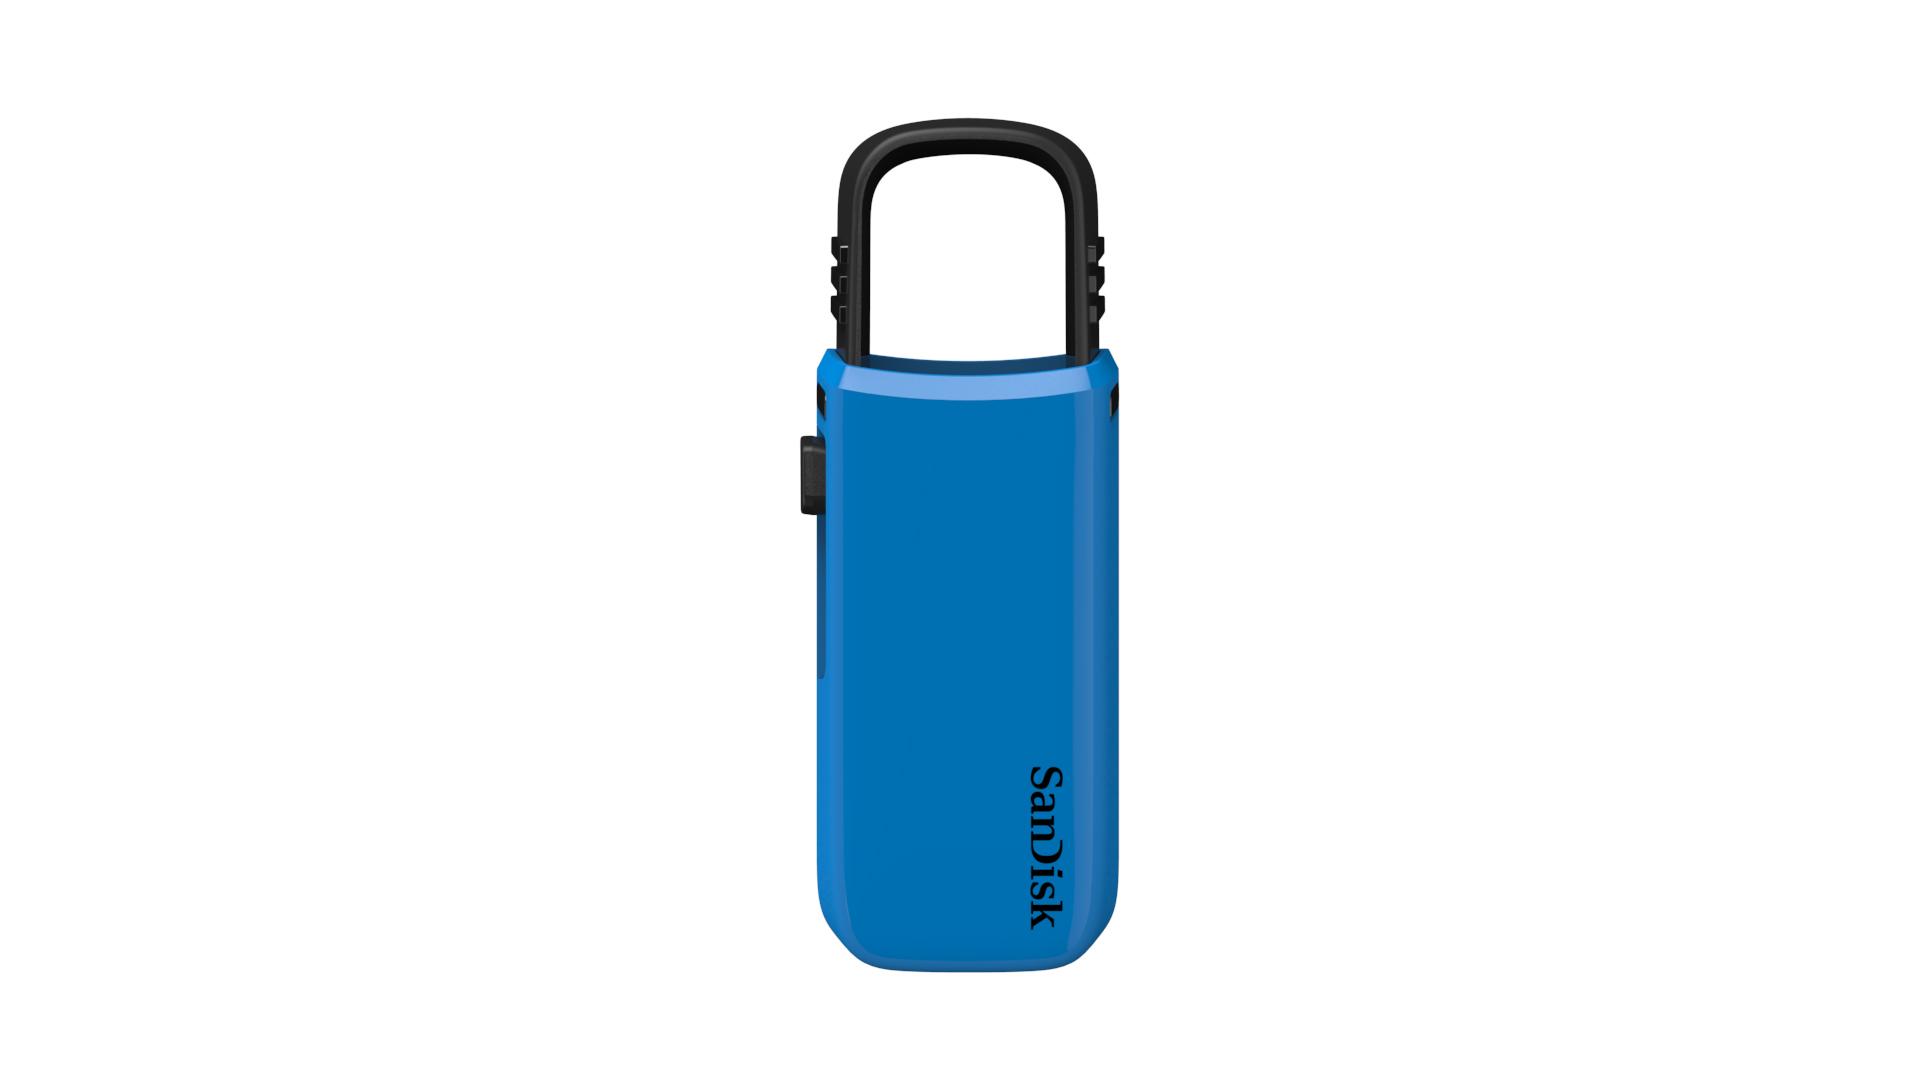 Sandisk Flash Disk Cruzer U 16 Gb Daftar Update Harga Terbaru Usb Flashdisk Cruizer Blade 16gb Blue Quick Review Drive Gough S Tech Zone Source